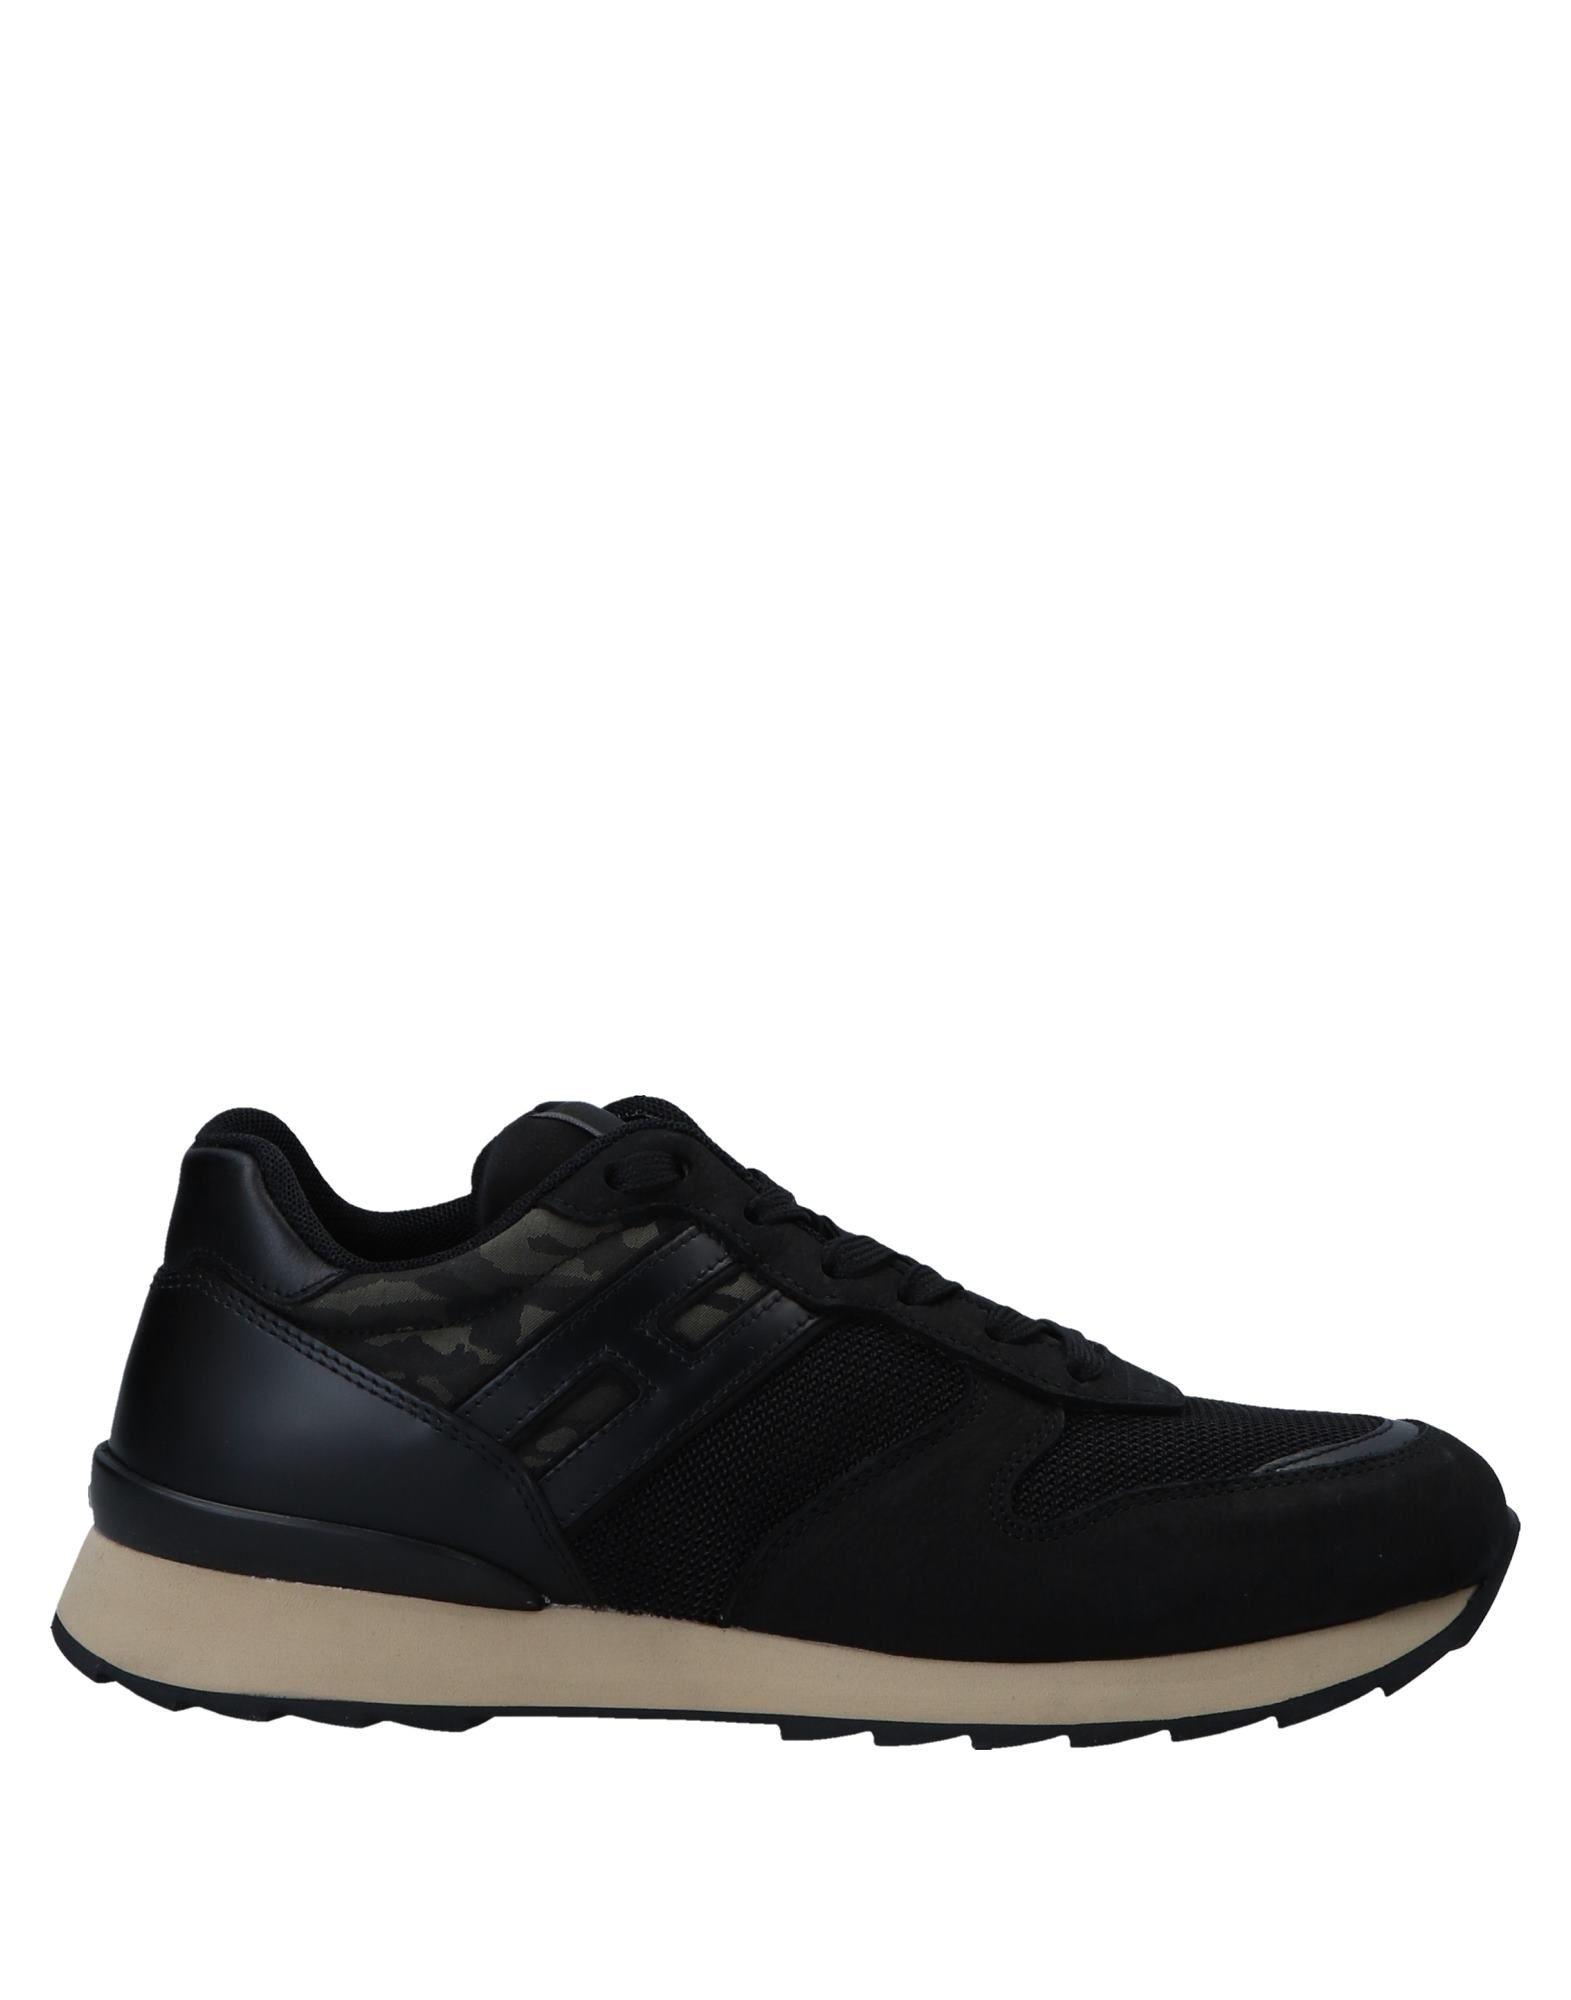 Hogan Sneakers Herren  11559735GL Gute Qualität beliebte Schuhe